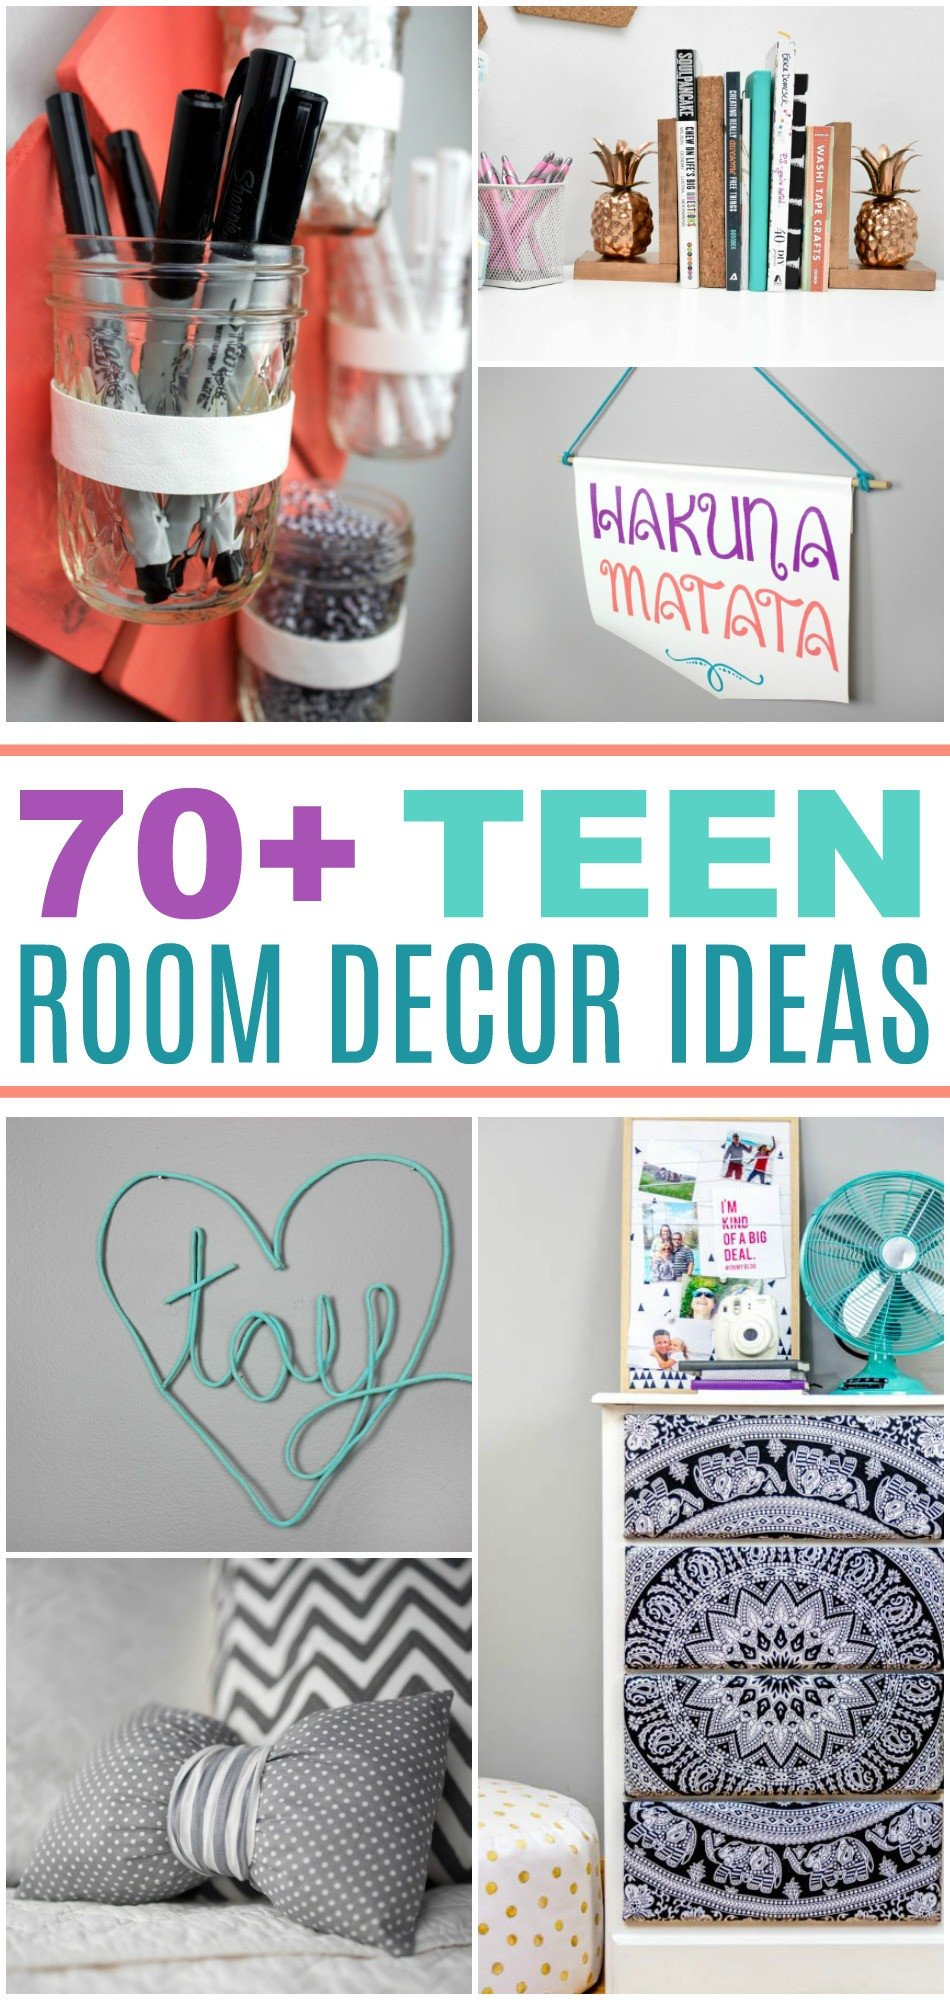 Diy Room Decor for Teens Inspirational 70 Diy Room Decor Ideas for Teens